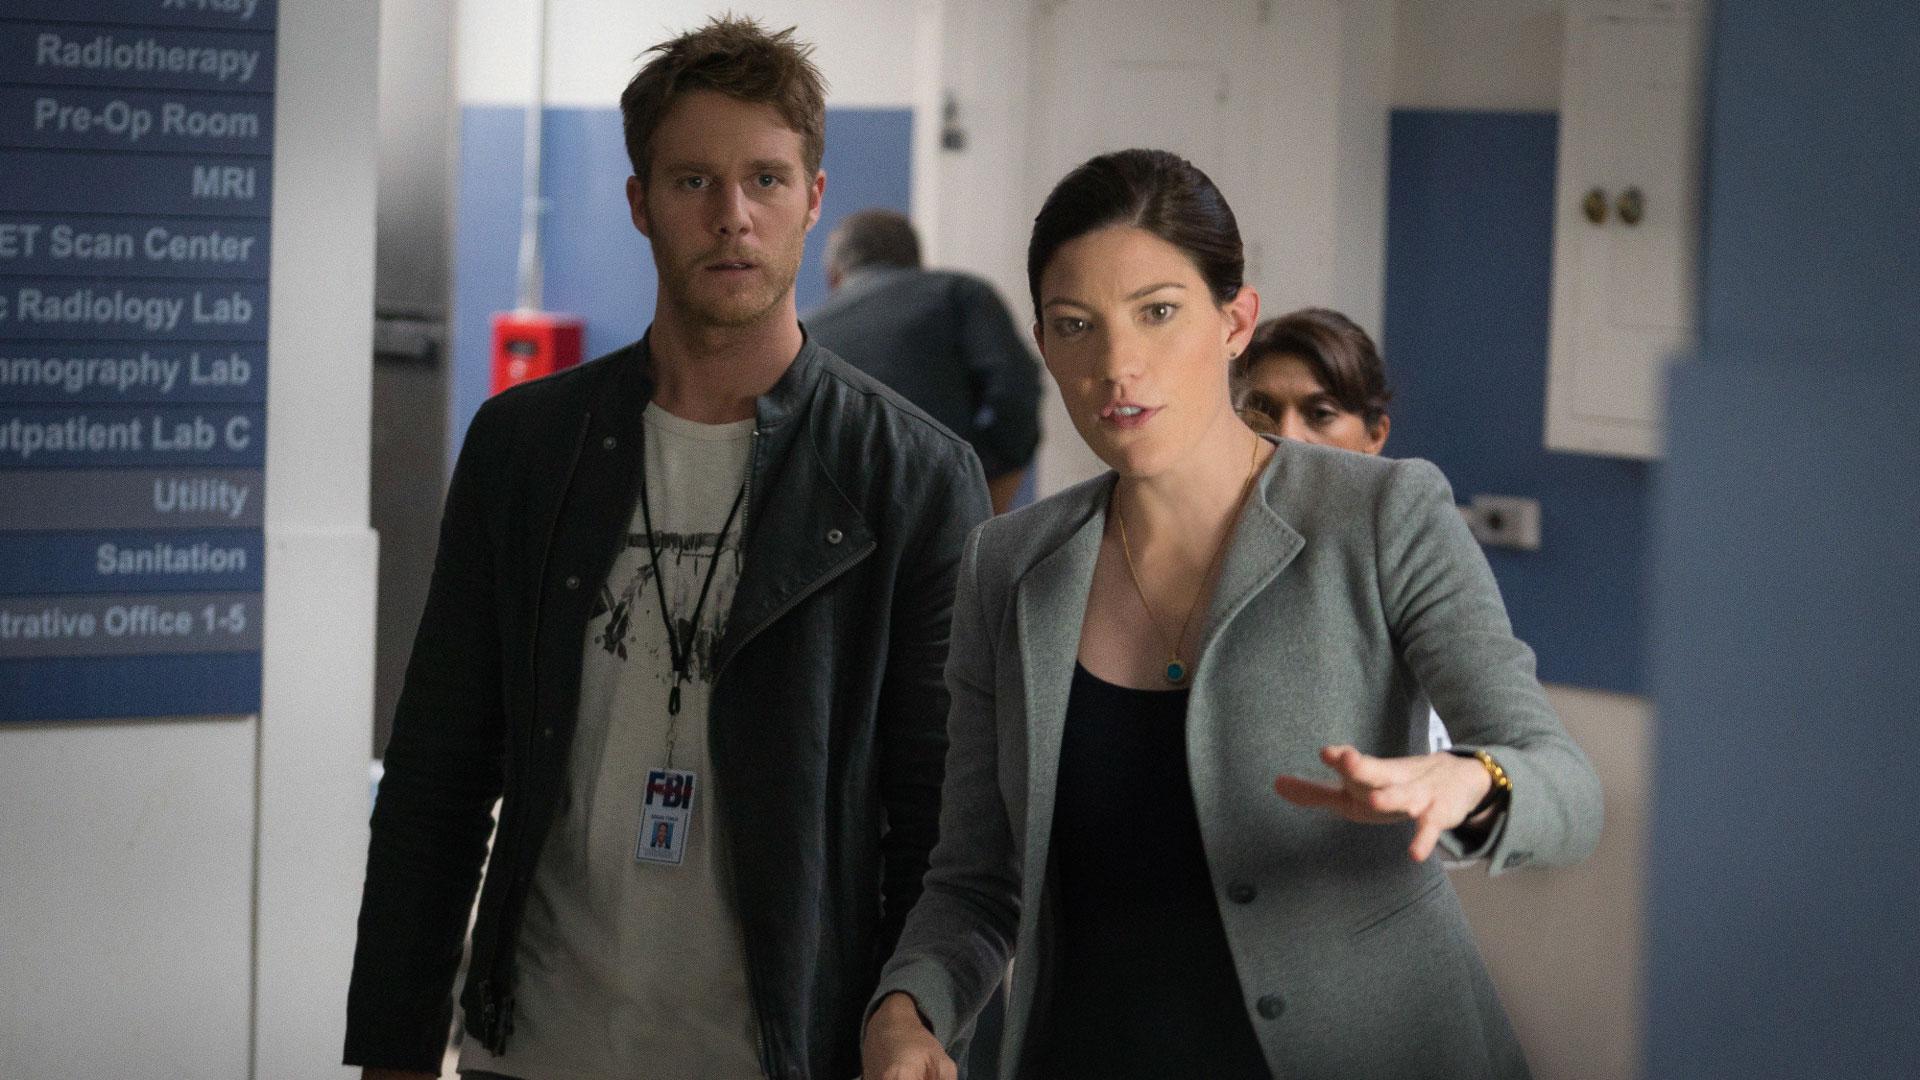 Jake McDorman as Brian Finch and Jennifer Carpenter as Agent Rebecca Harris